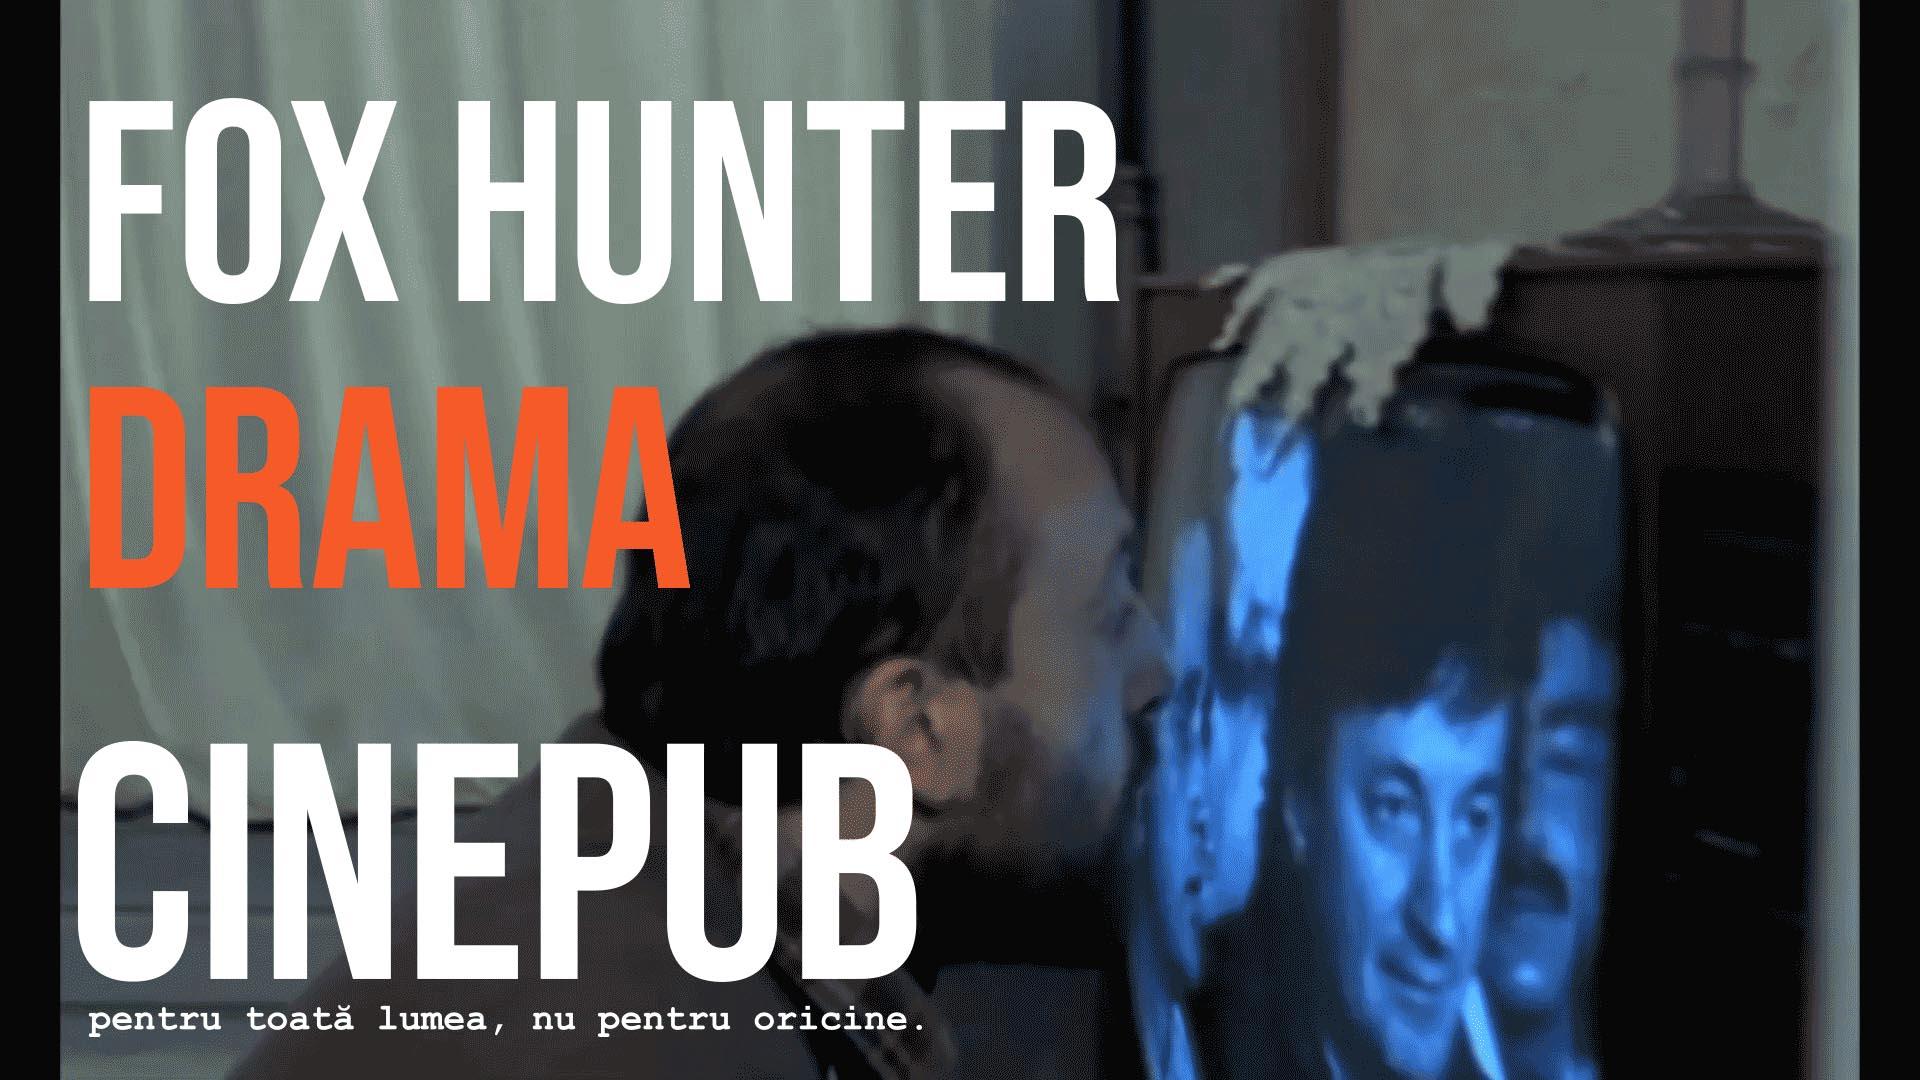 Fox Hunter - feature film online by Stere Gulea - CINEPUB